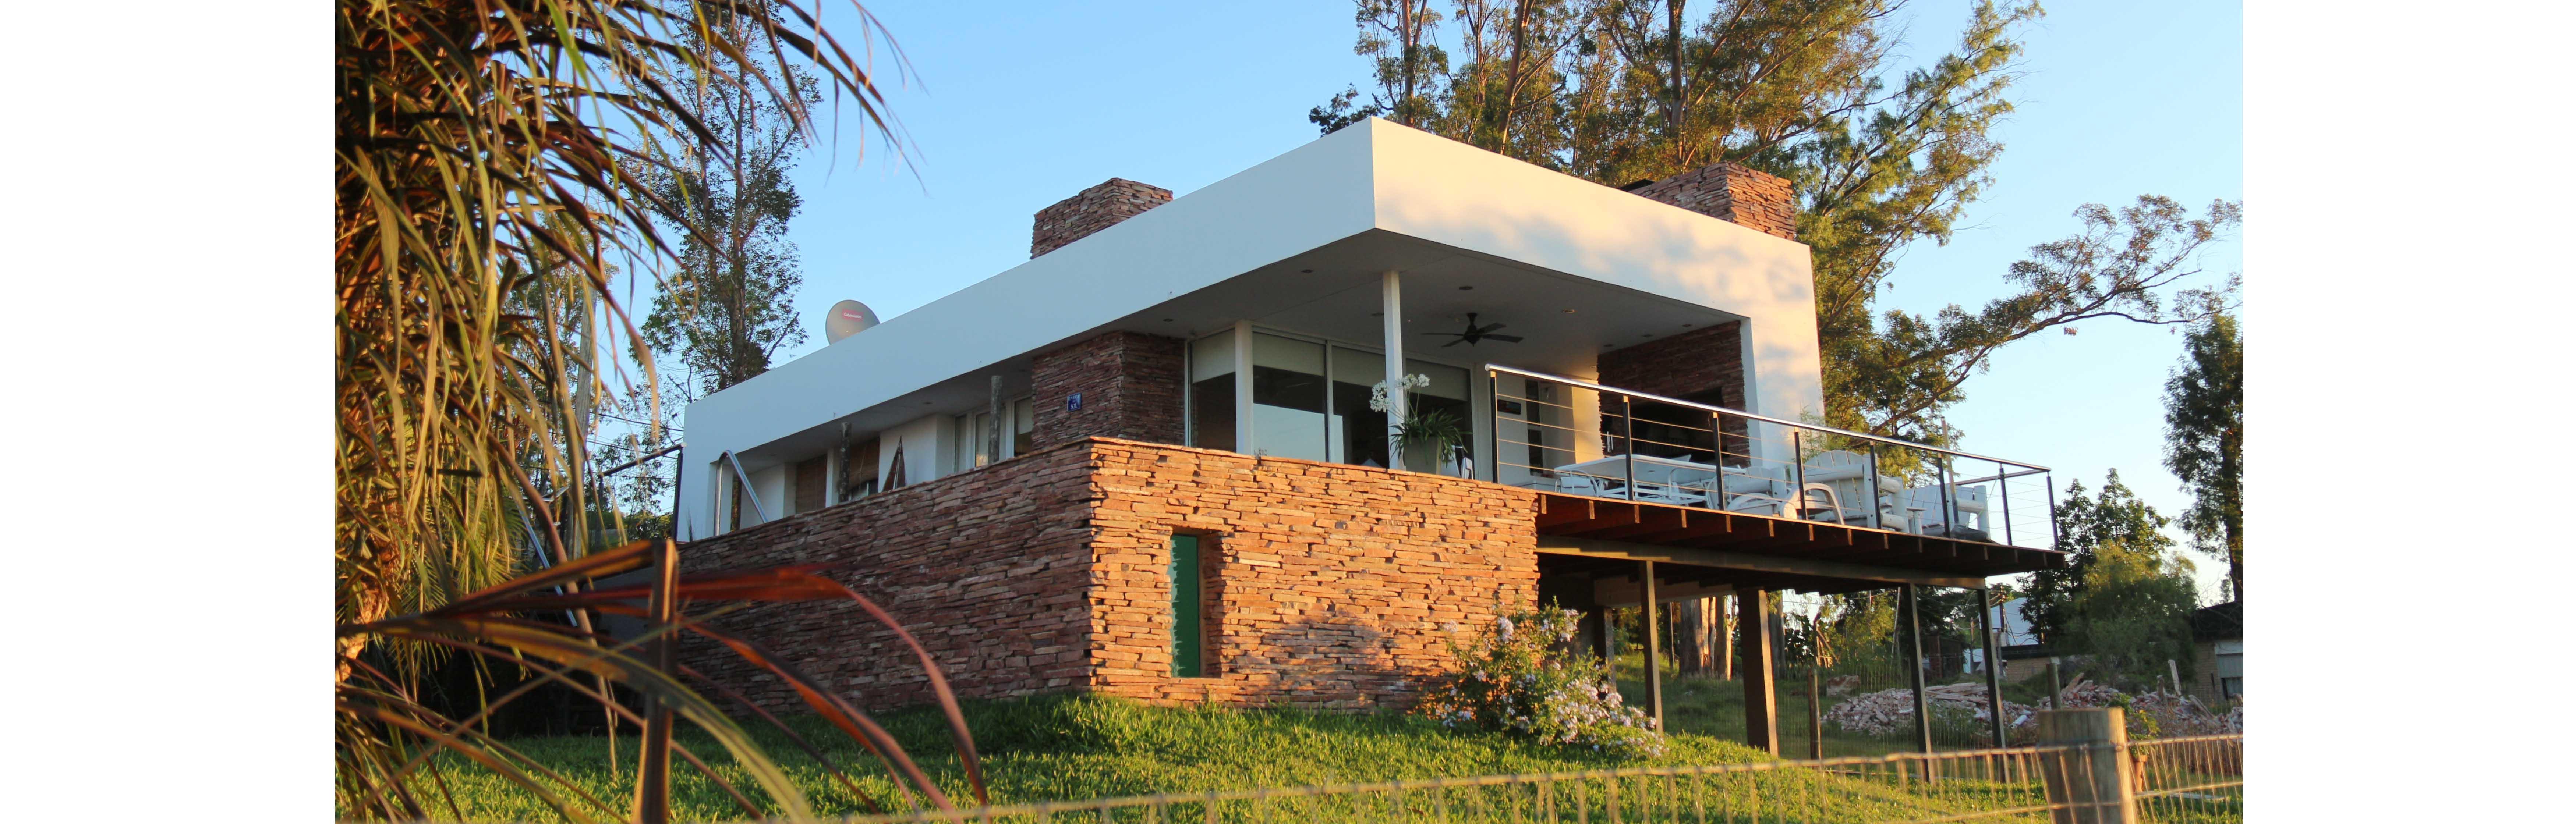 Casa en Arenitas Blancas / Estudio AV